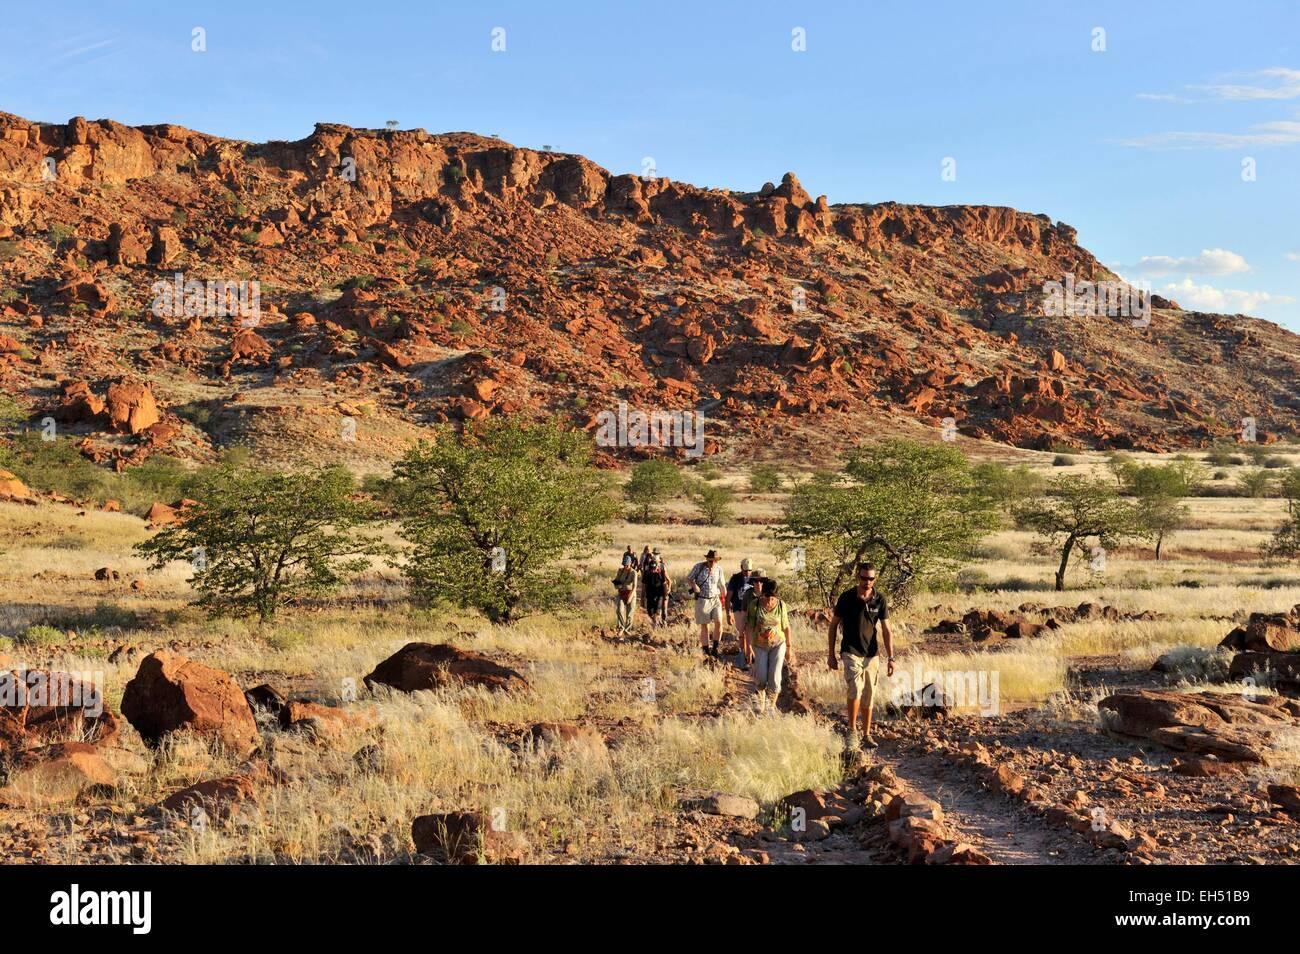 Namibia, Damaraland, Twyfeltontein, listed as World Heritage by UNESCO - Stock Image